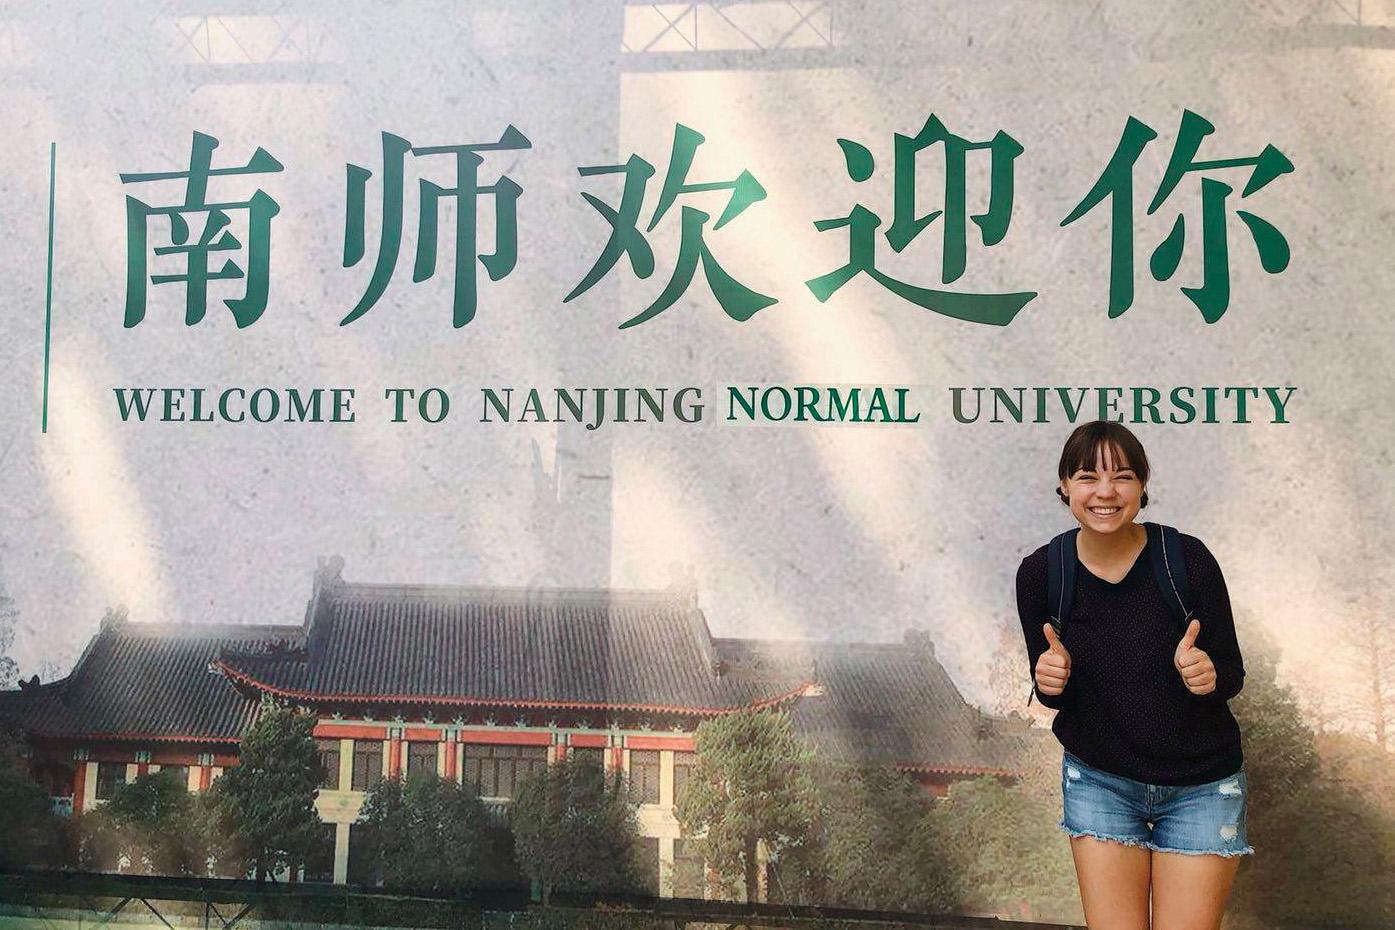 Mackenzie Miller '18 at Nanjing Normal University in China.